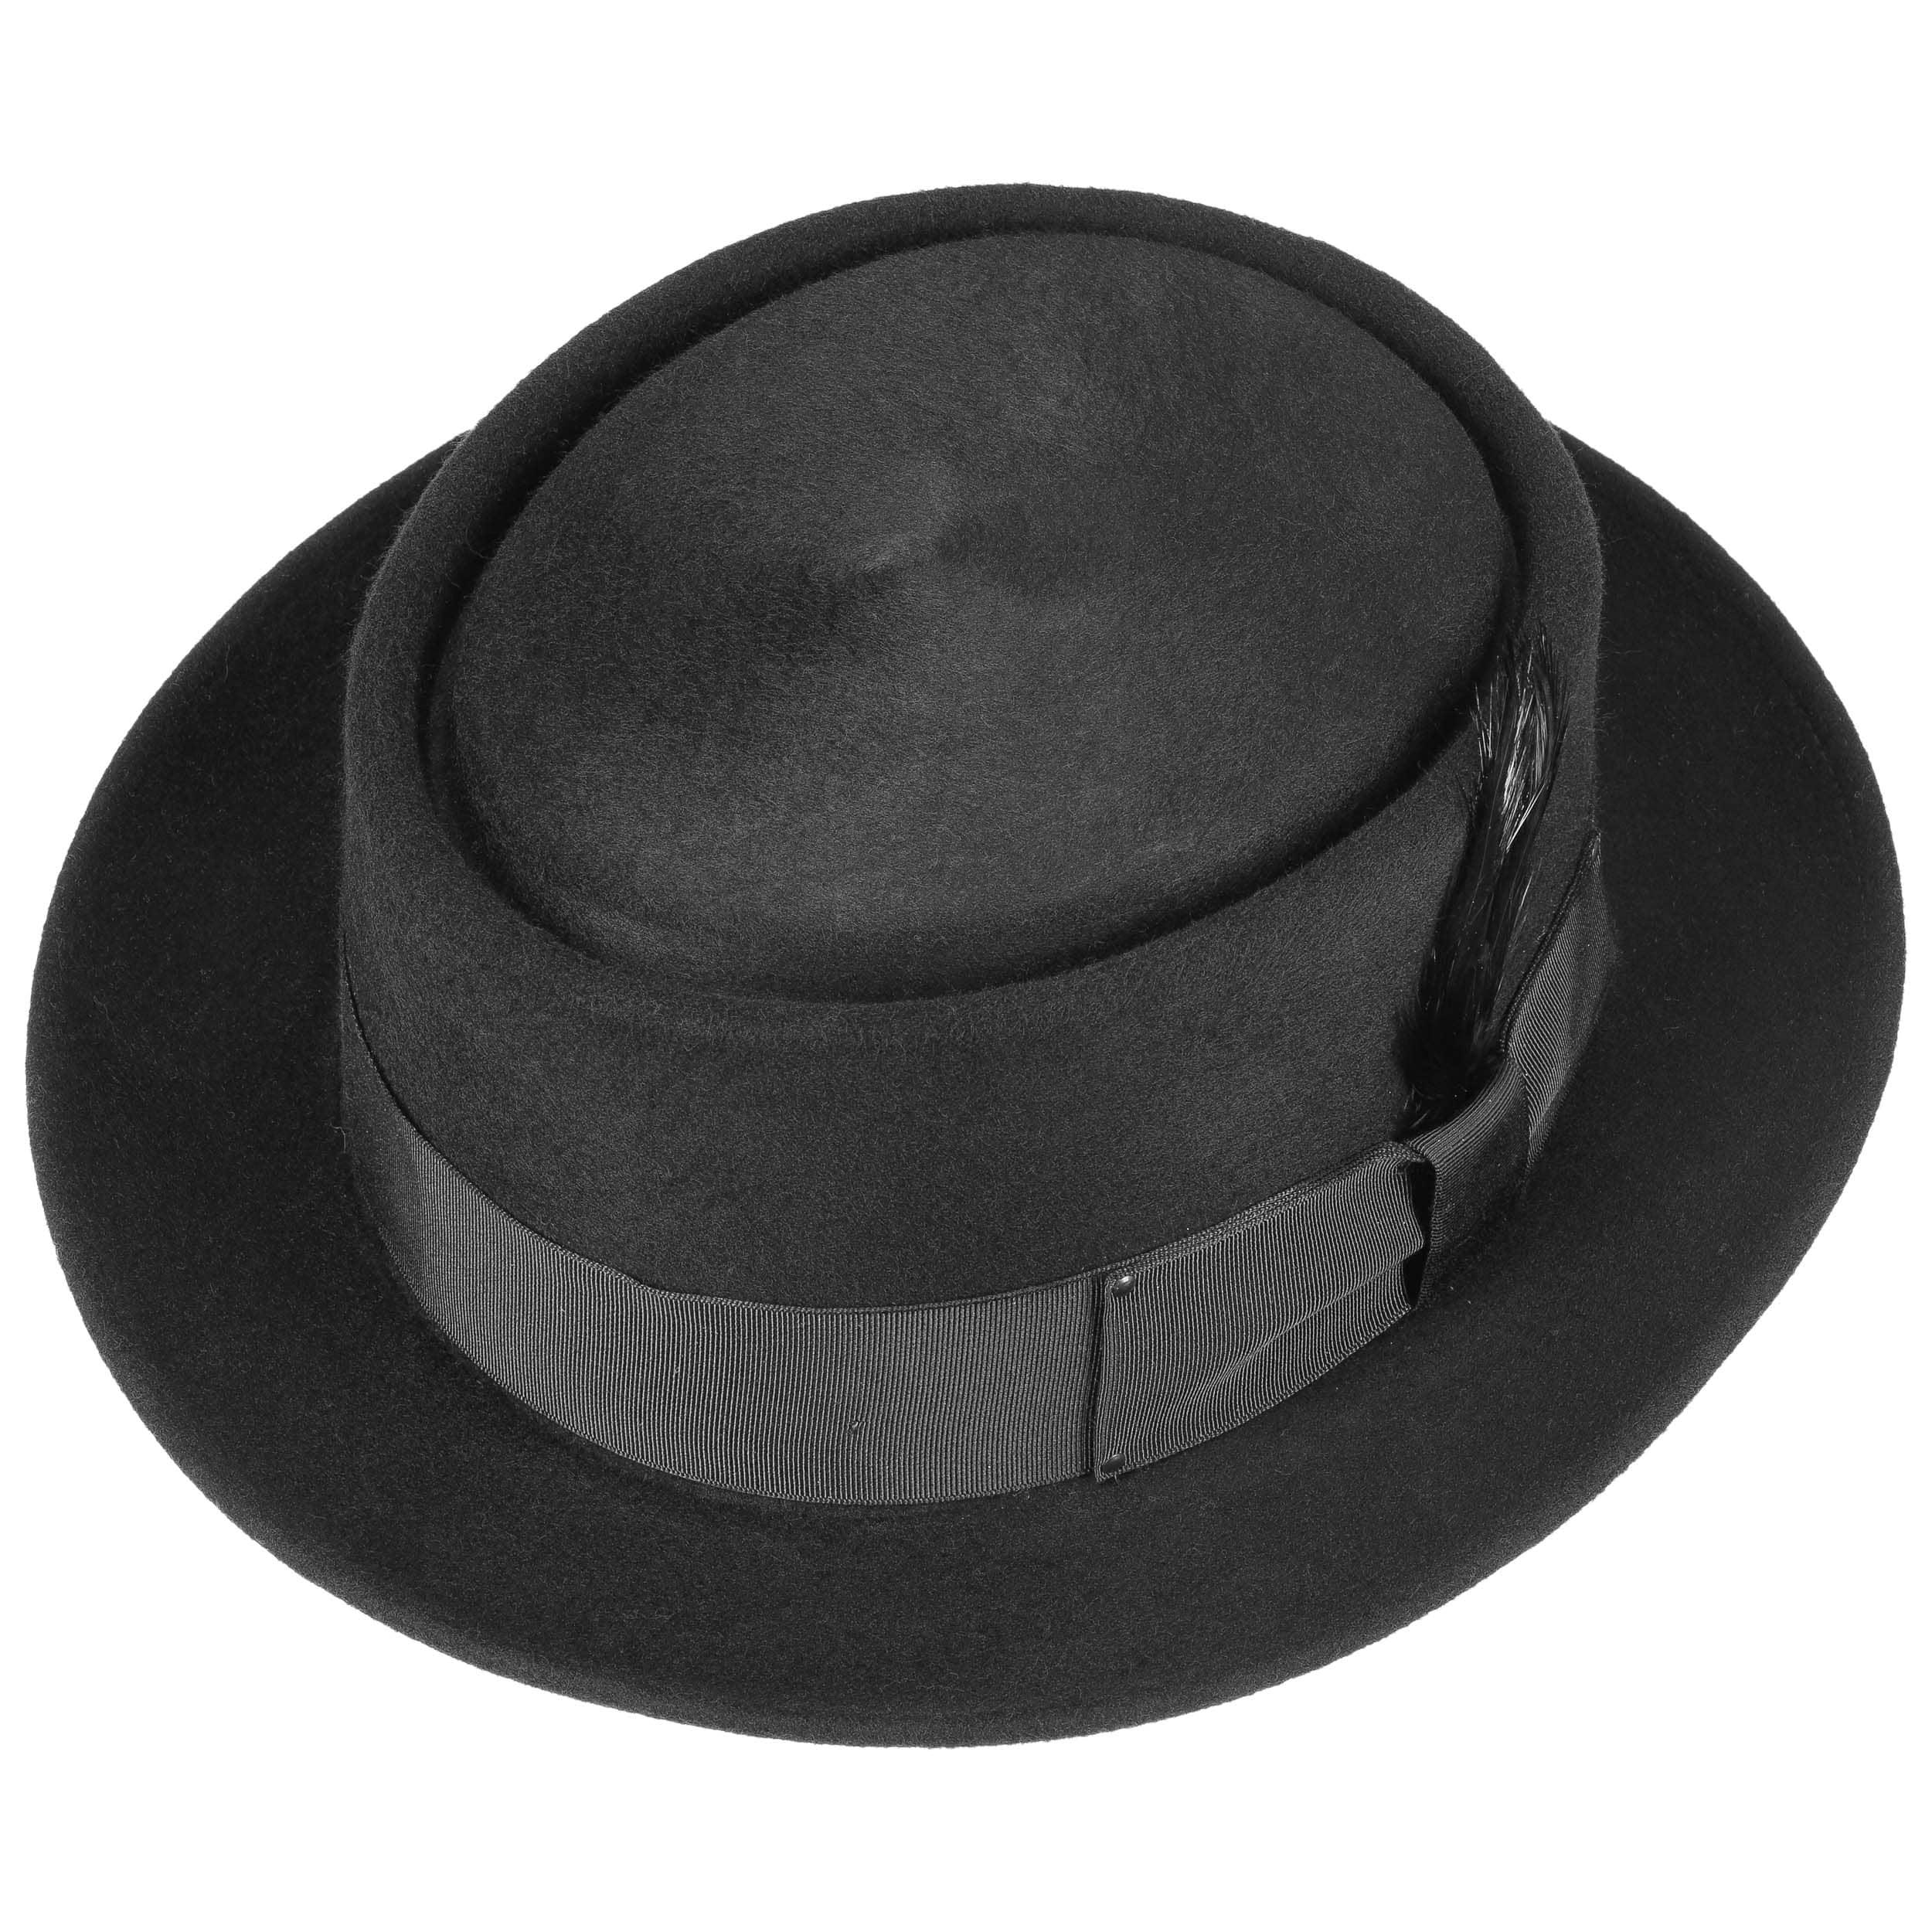 c44d15b6c Jett Porkpie Hat by Bailey of Hollywood